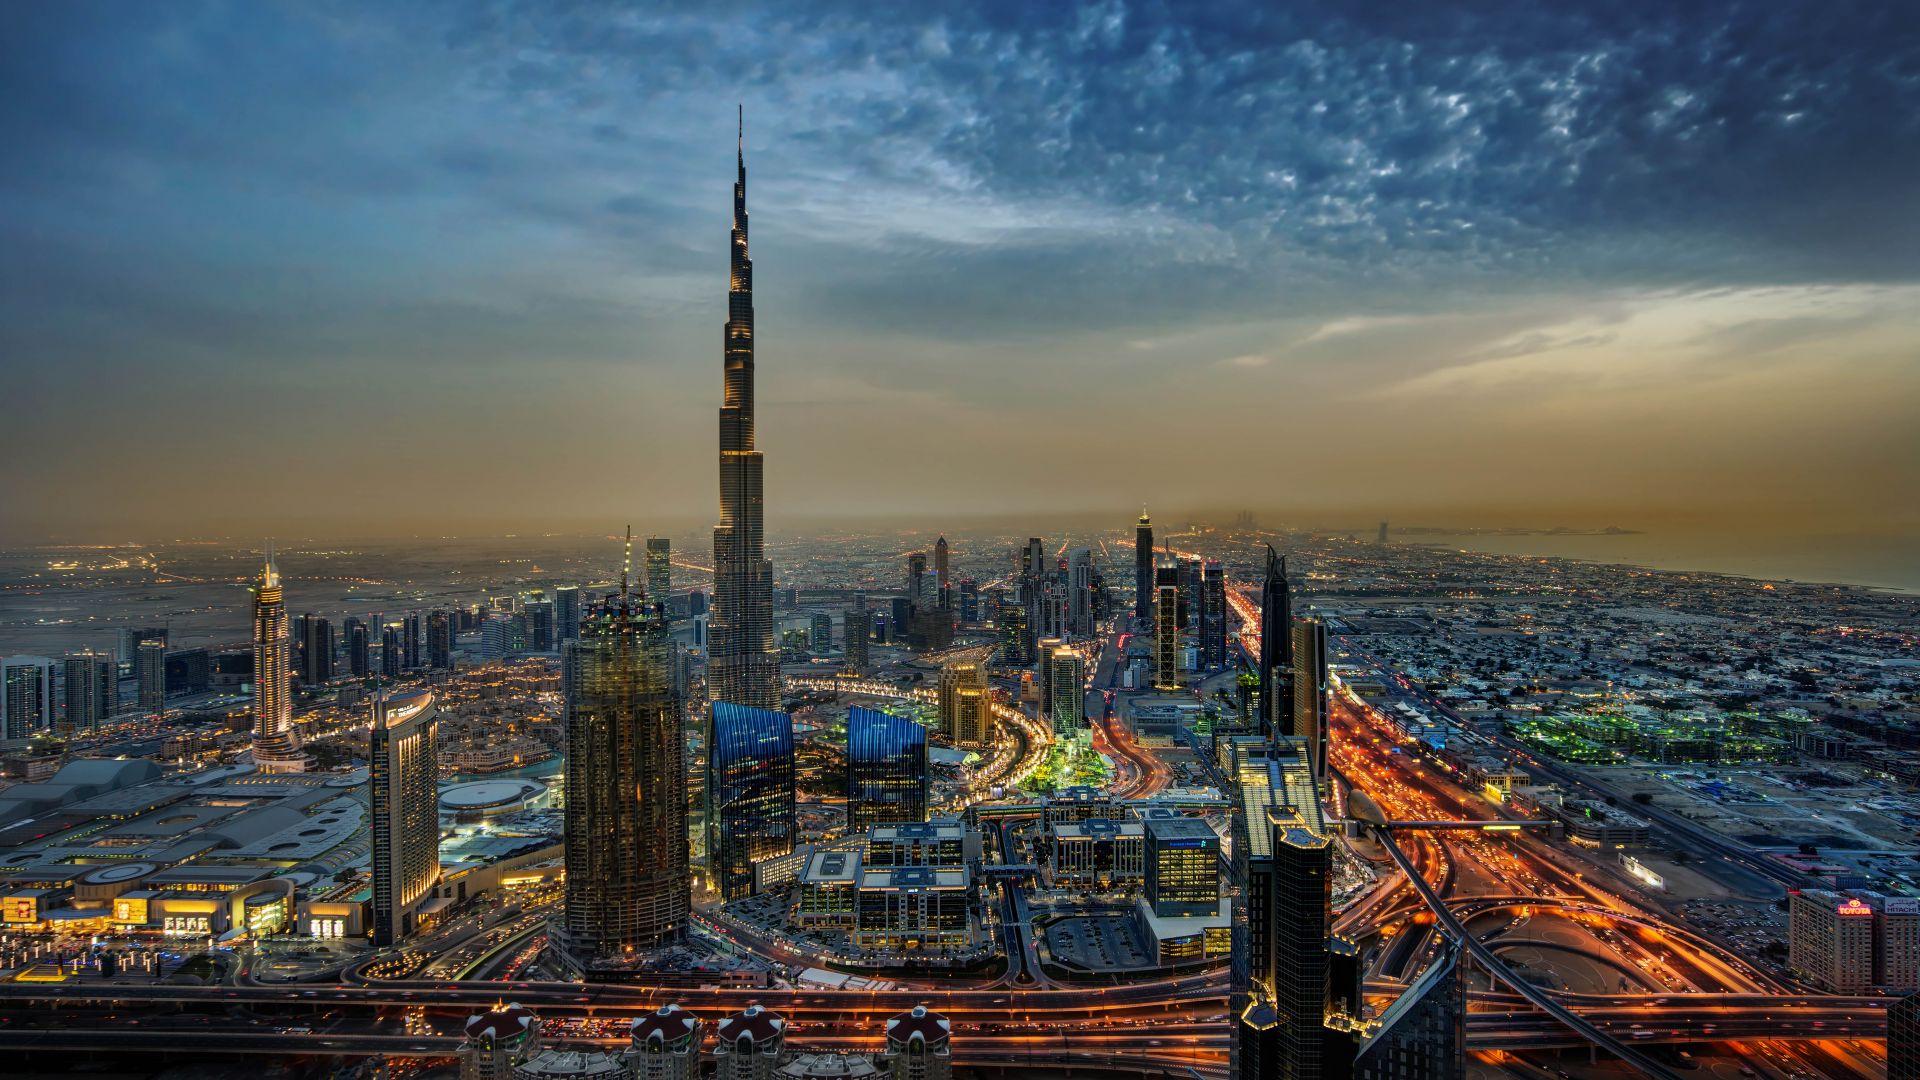 Wallpaper Burj Khalifa, dubai, city, night, buildings, aerial view